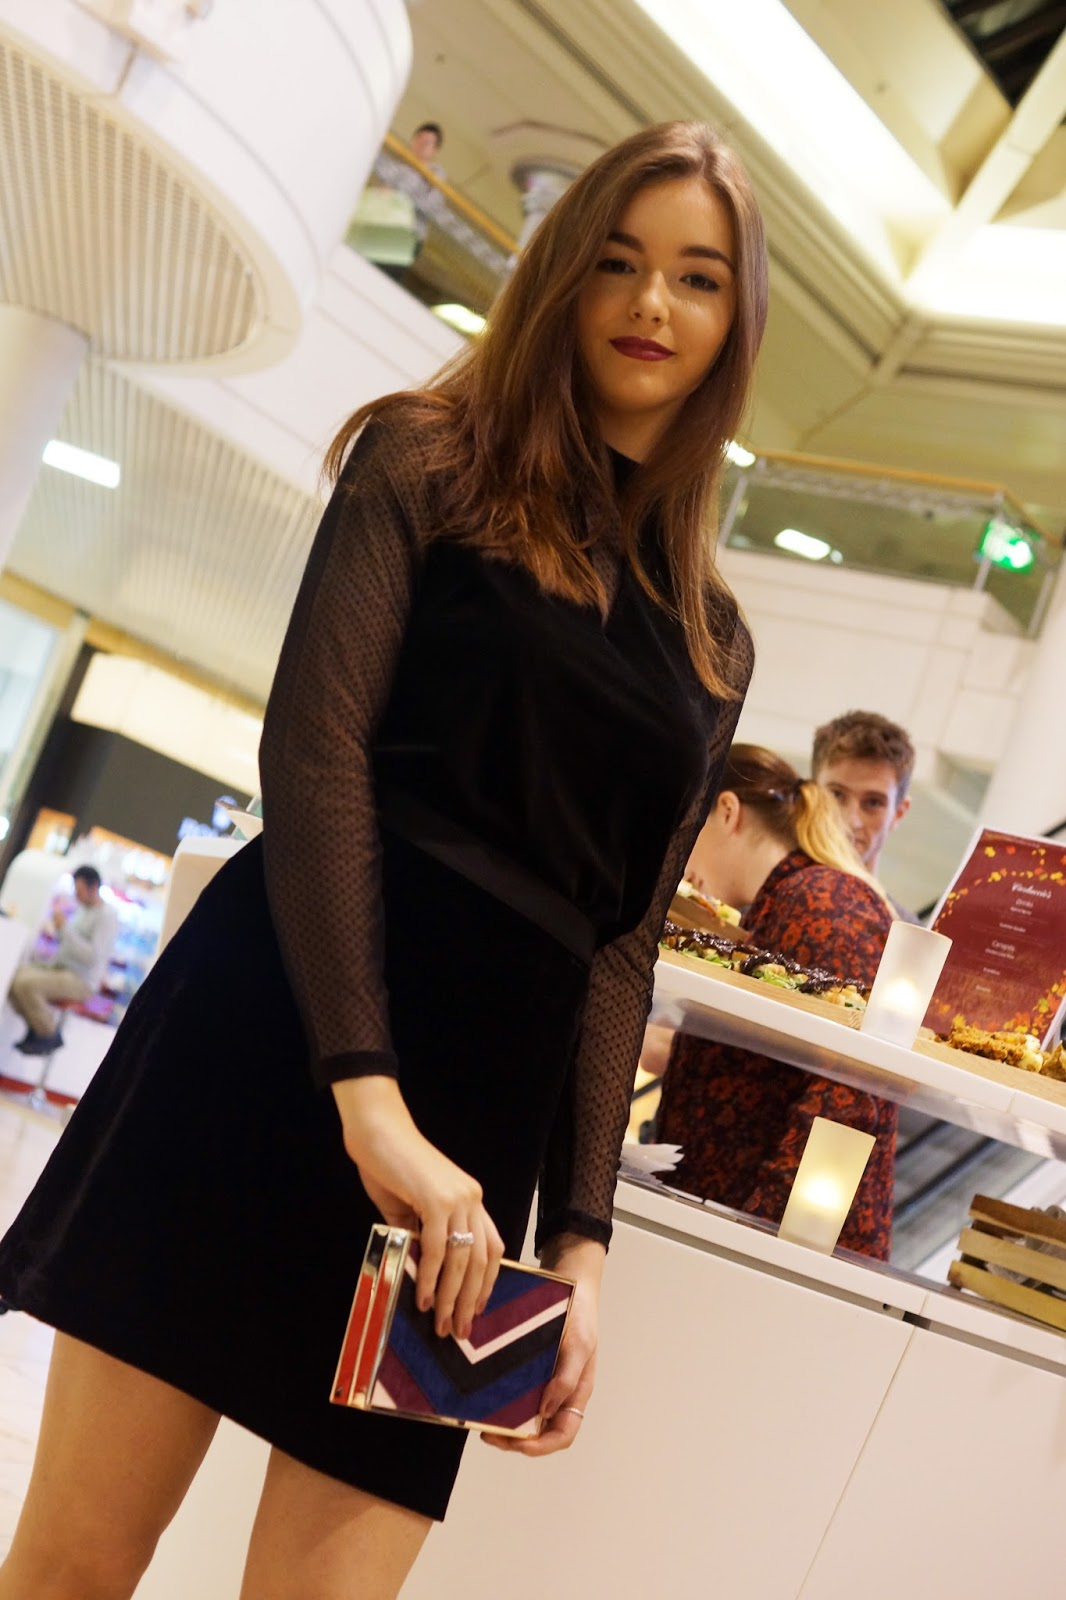 AW16 Style Intu Metrocentre Seasonal Trends North East Bloggers